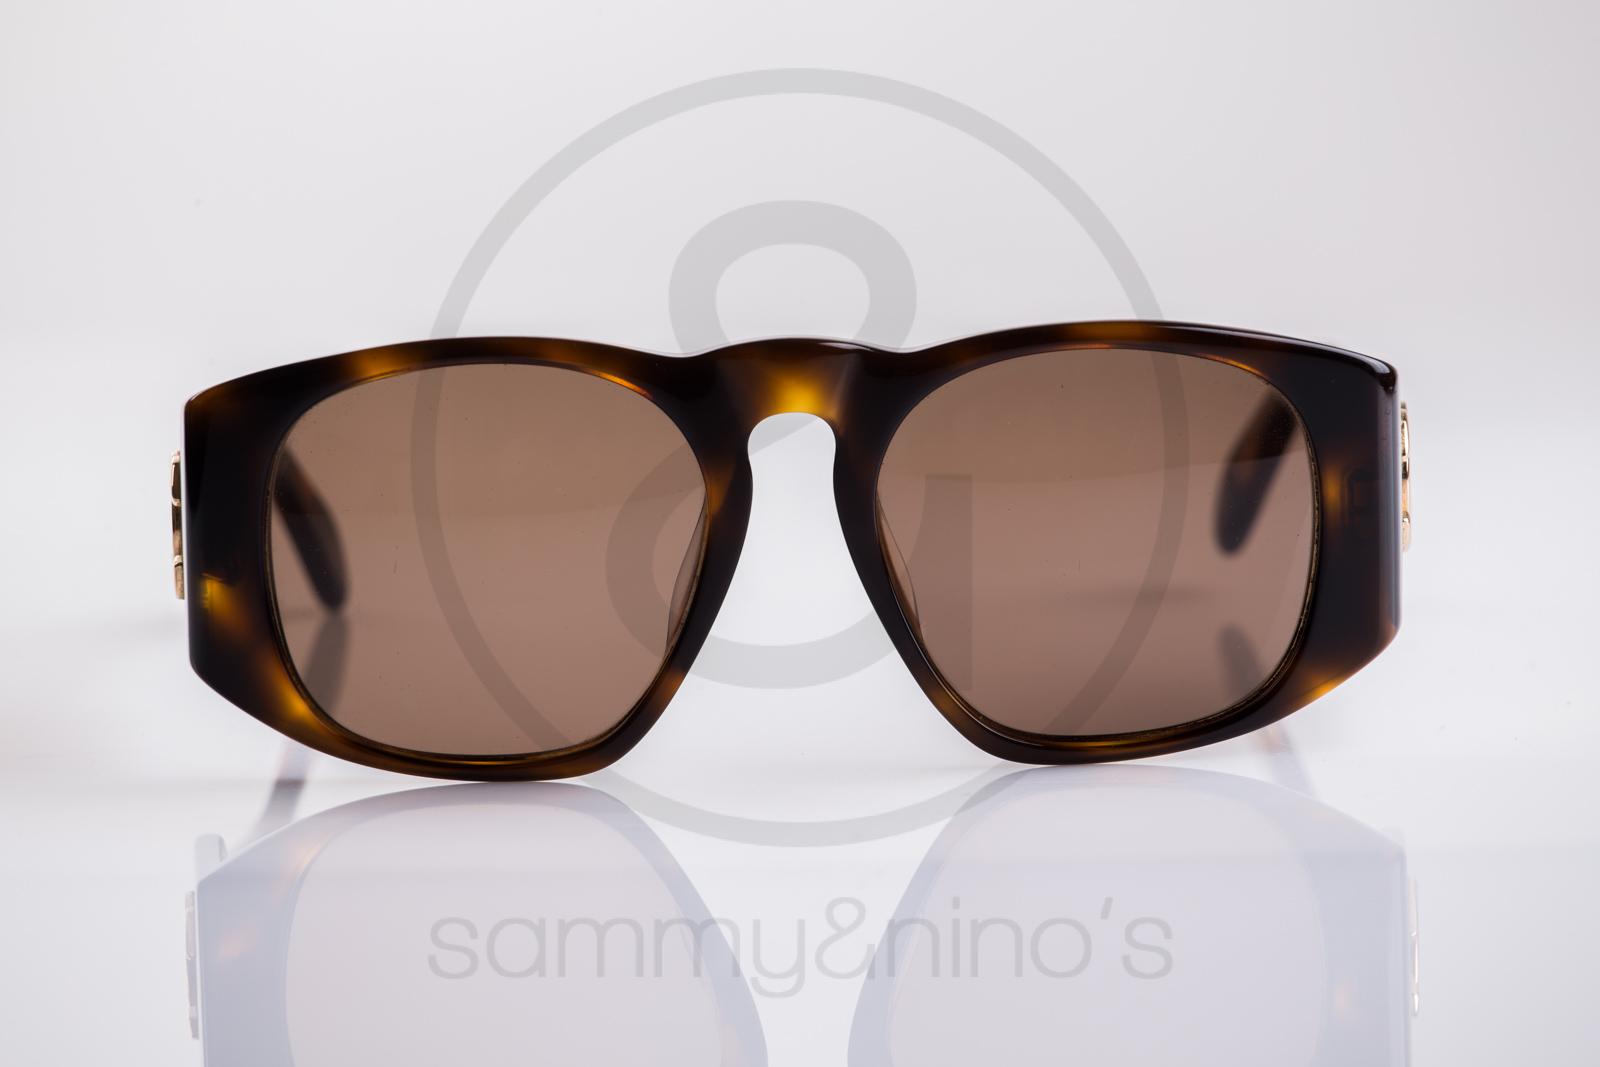 Gold Frame Chanel Sunglasses : Chanel 01451 Sammy & Ninos Store